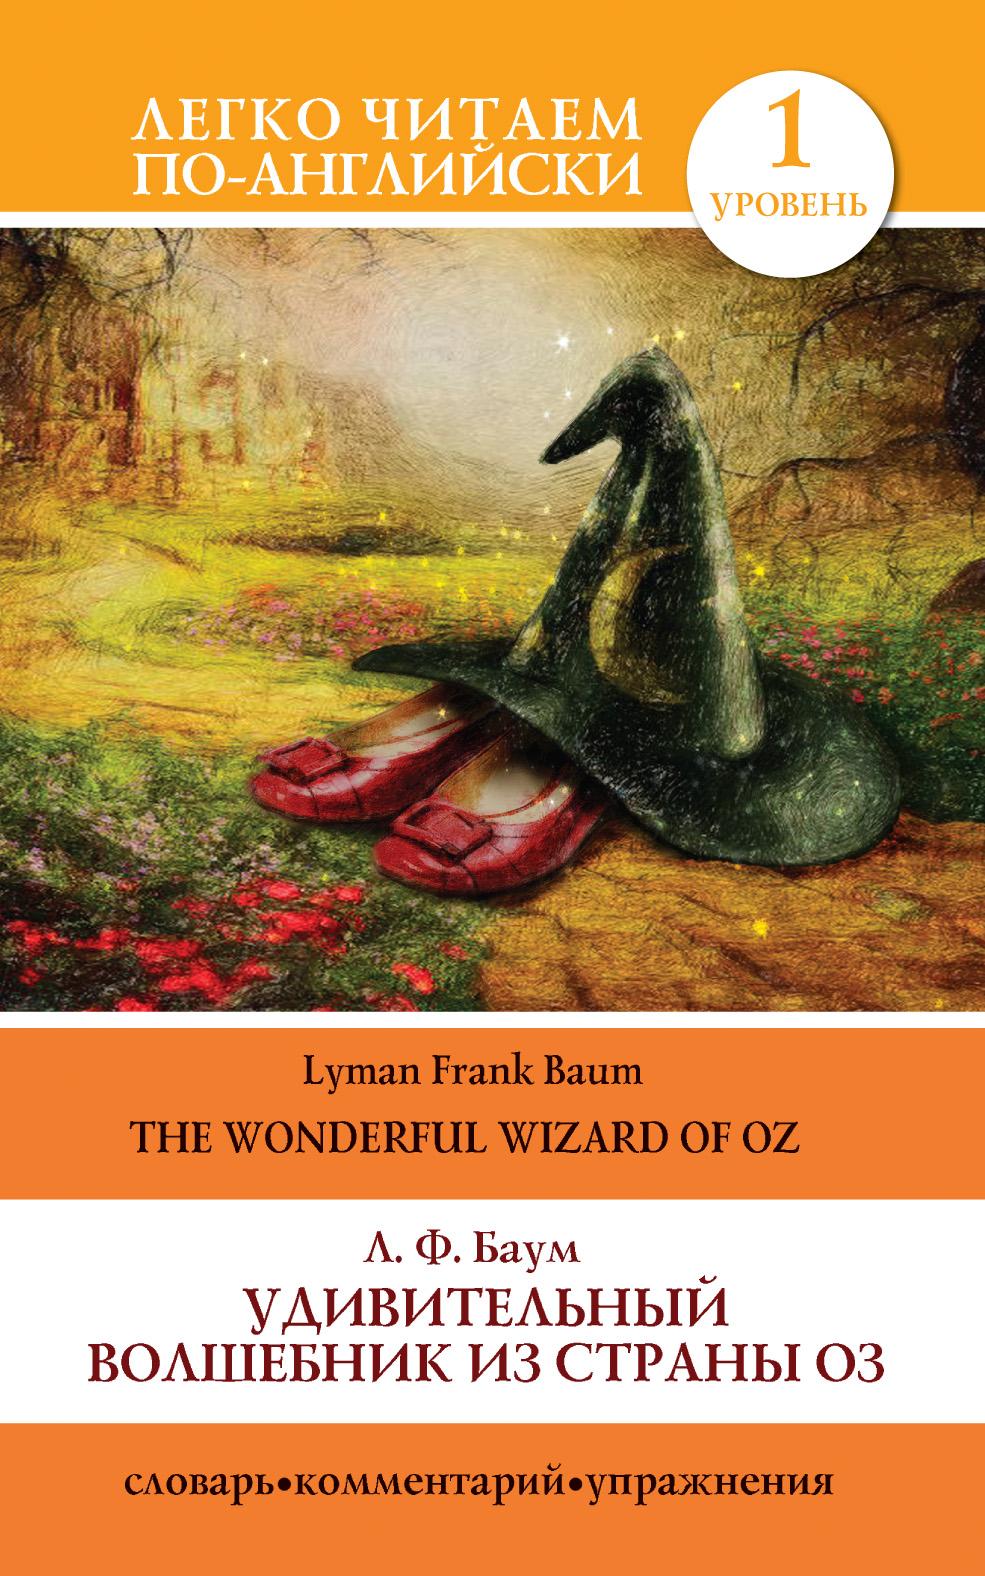 Лаймен Фрэнк Баум Удивительный волшебник из страны Оз / The Wonderful Wizard of Oz баум л the wonderful wizard of oz